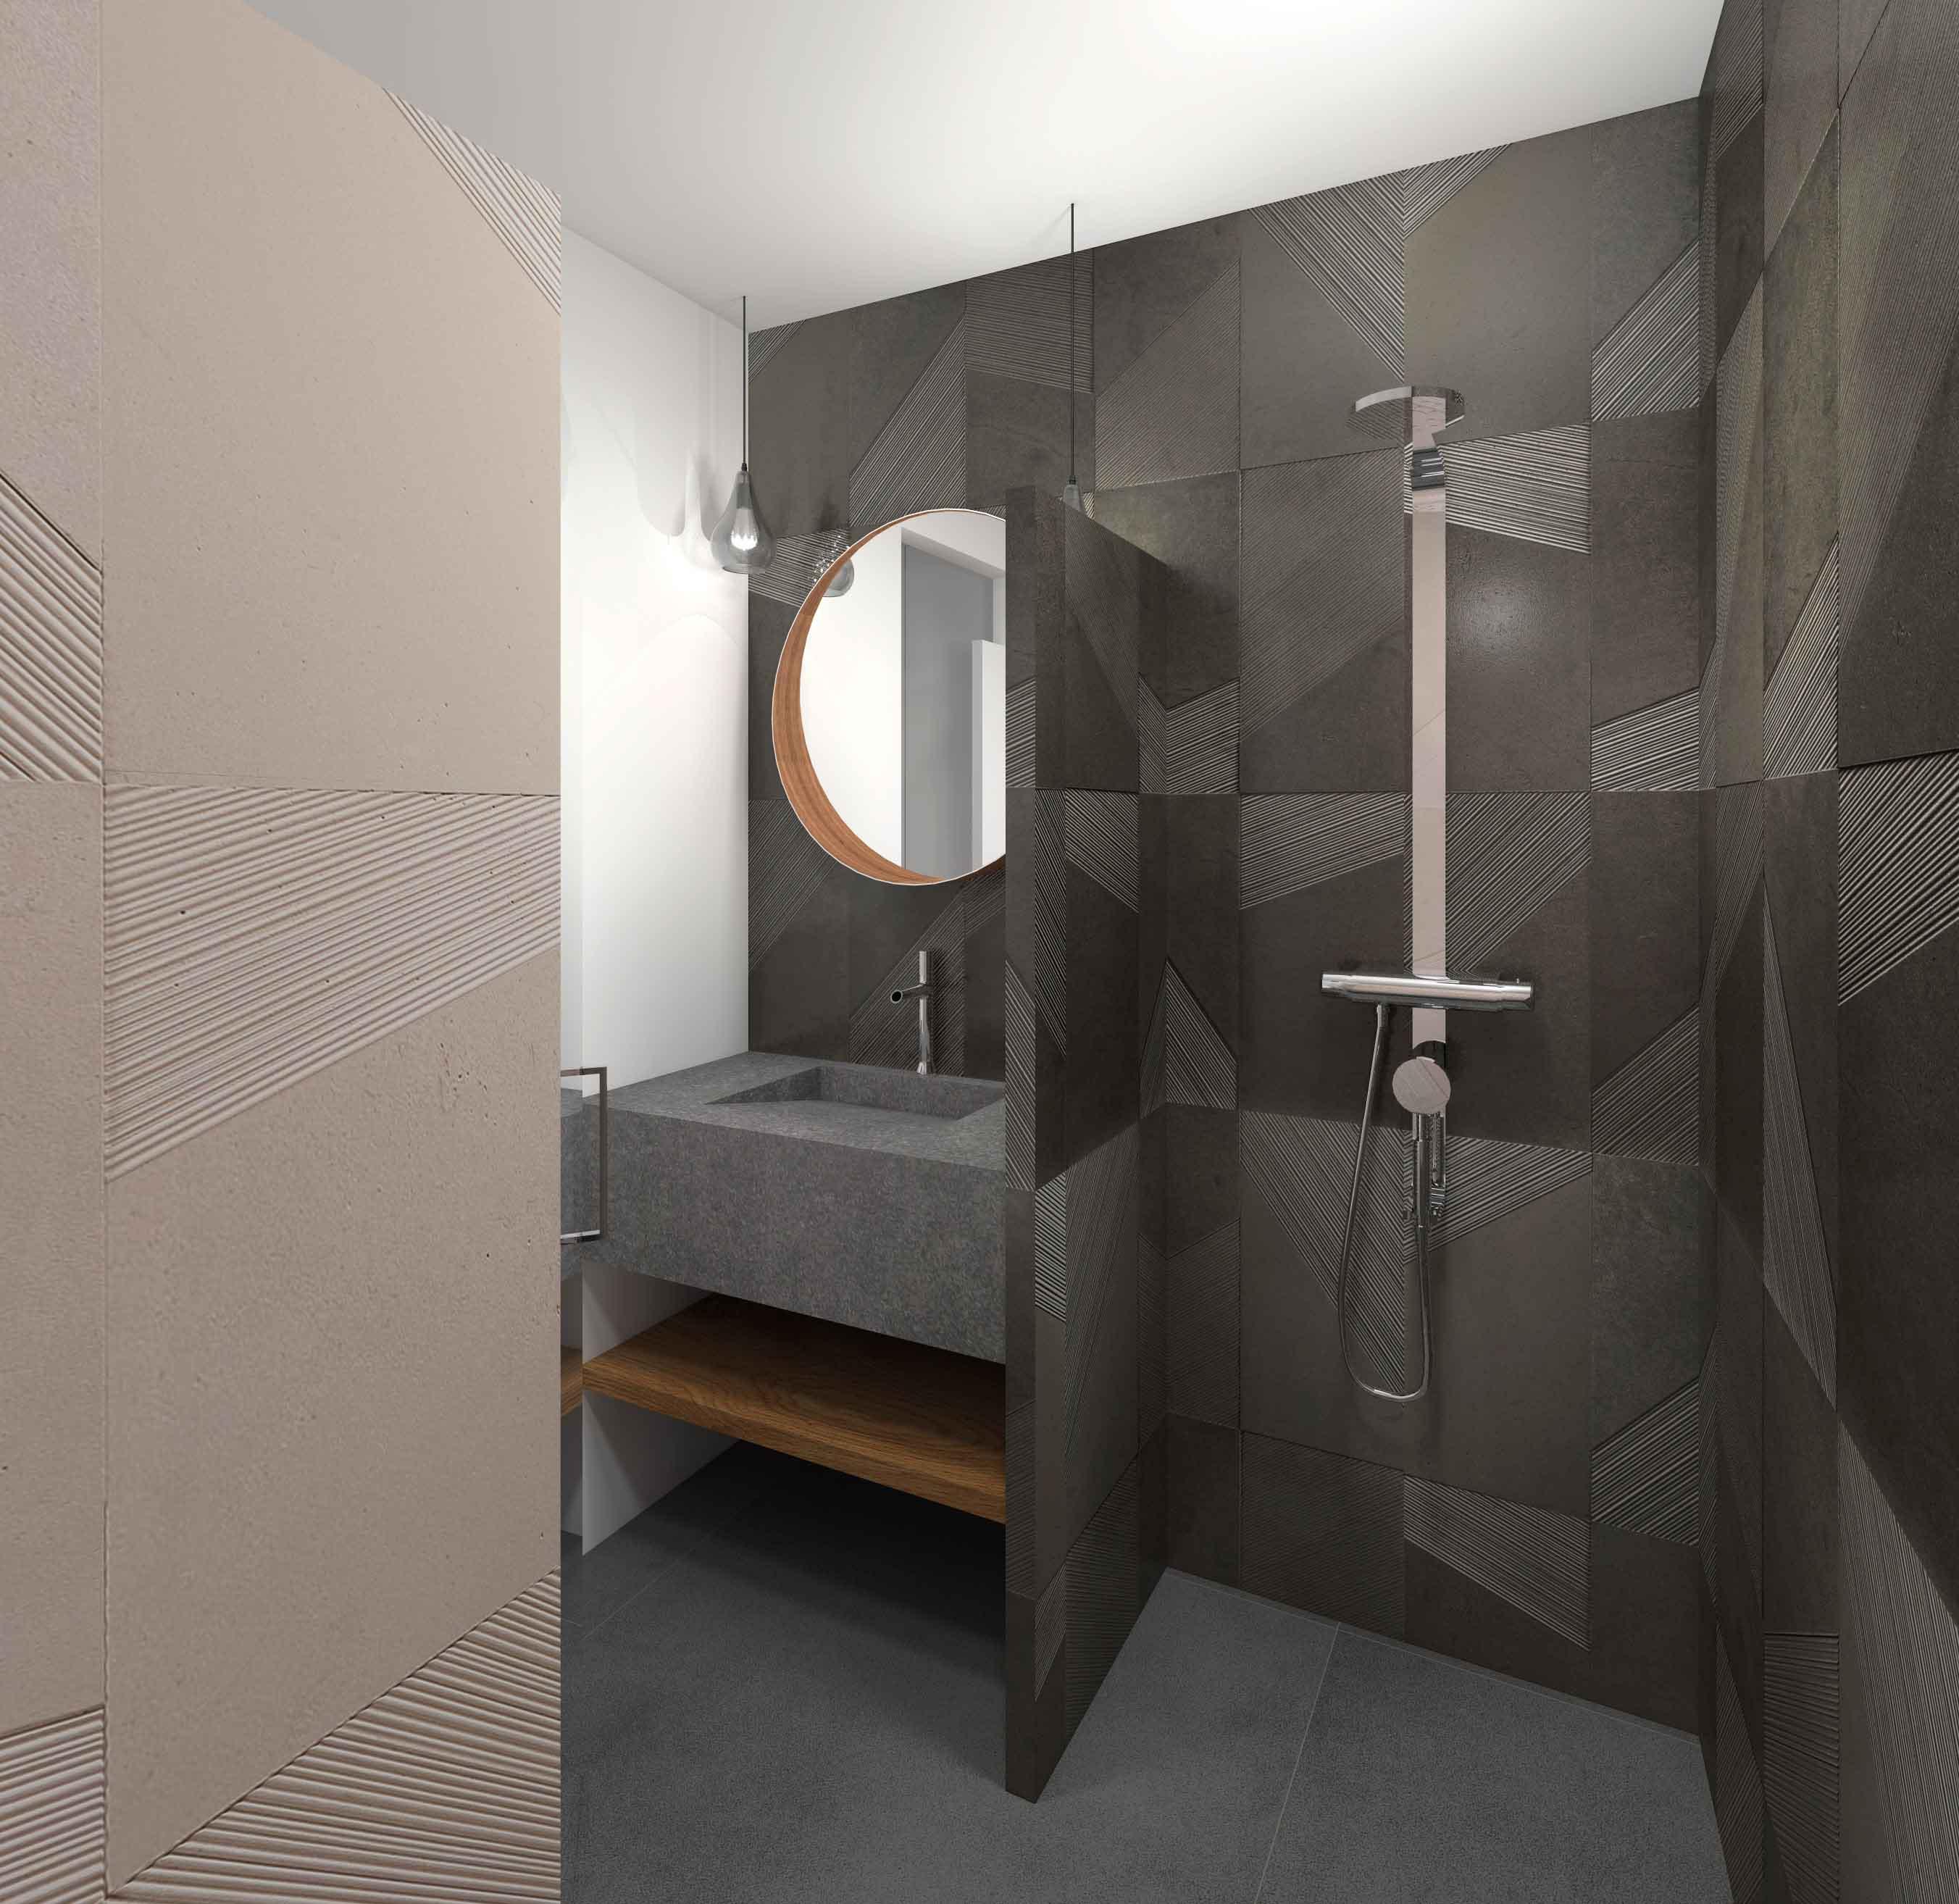 salle de bain paris 11 ForSalle De Bain Paris 11